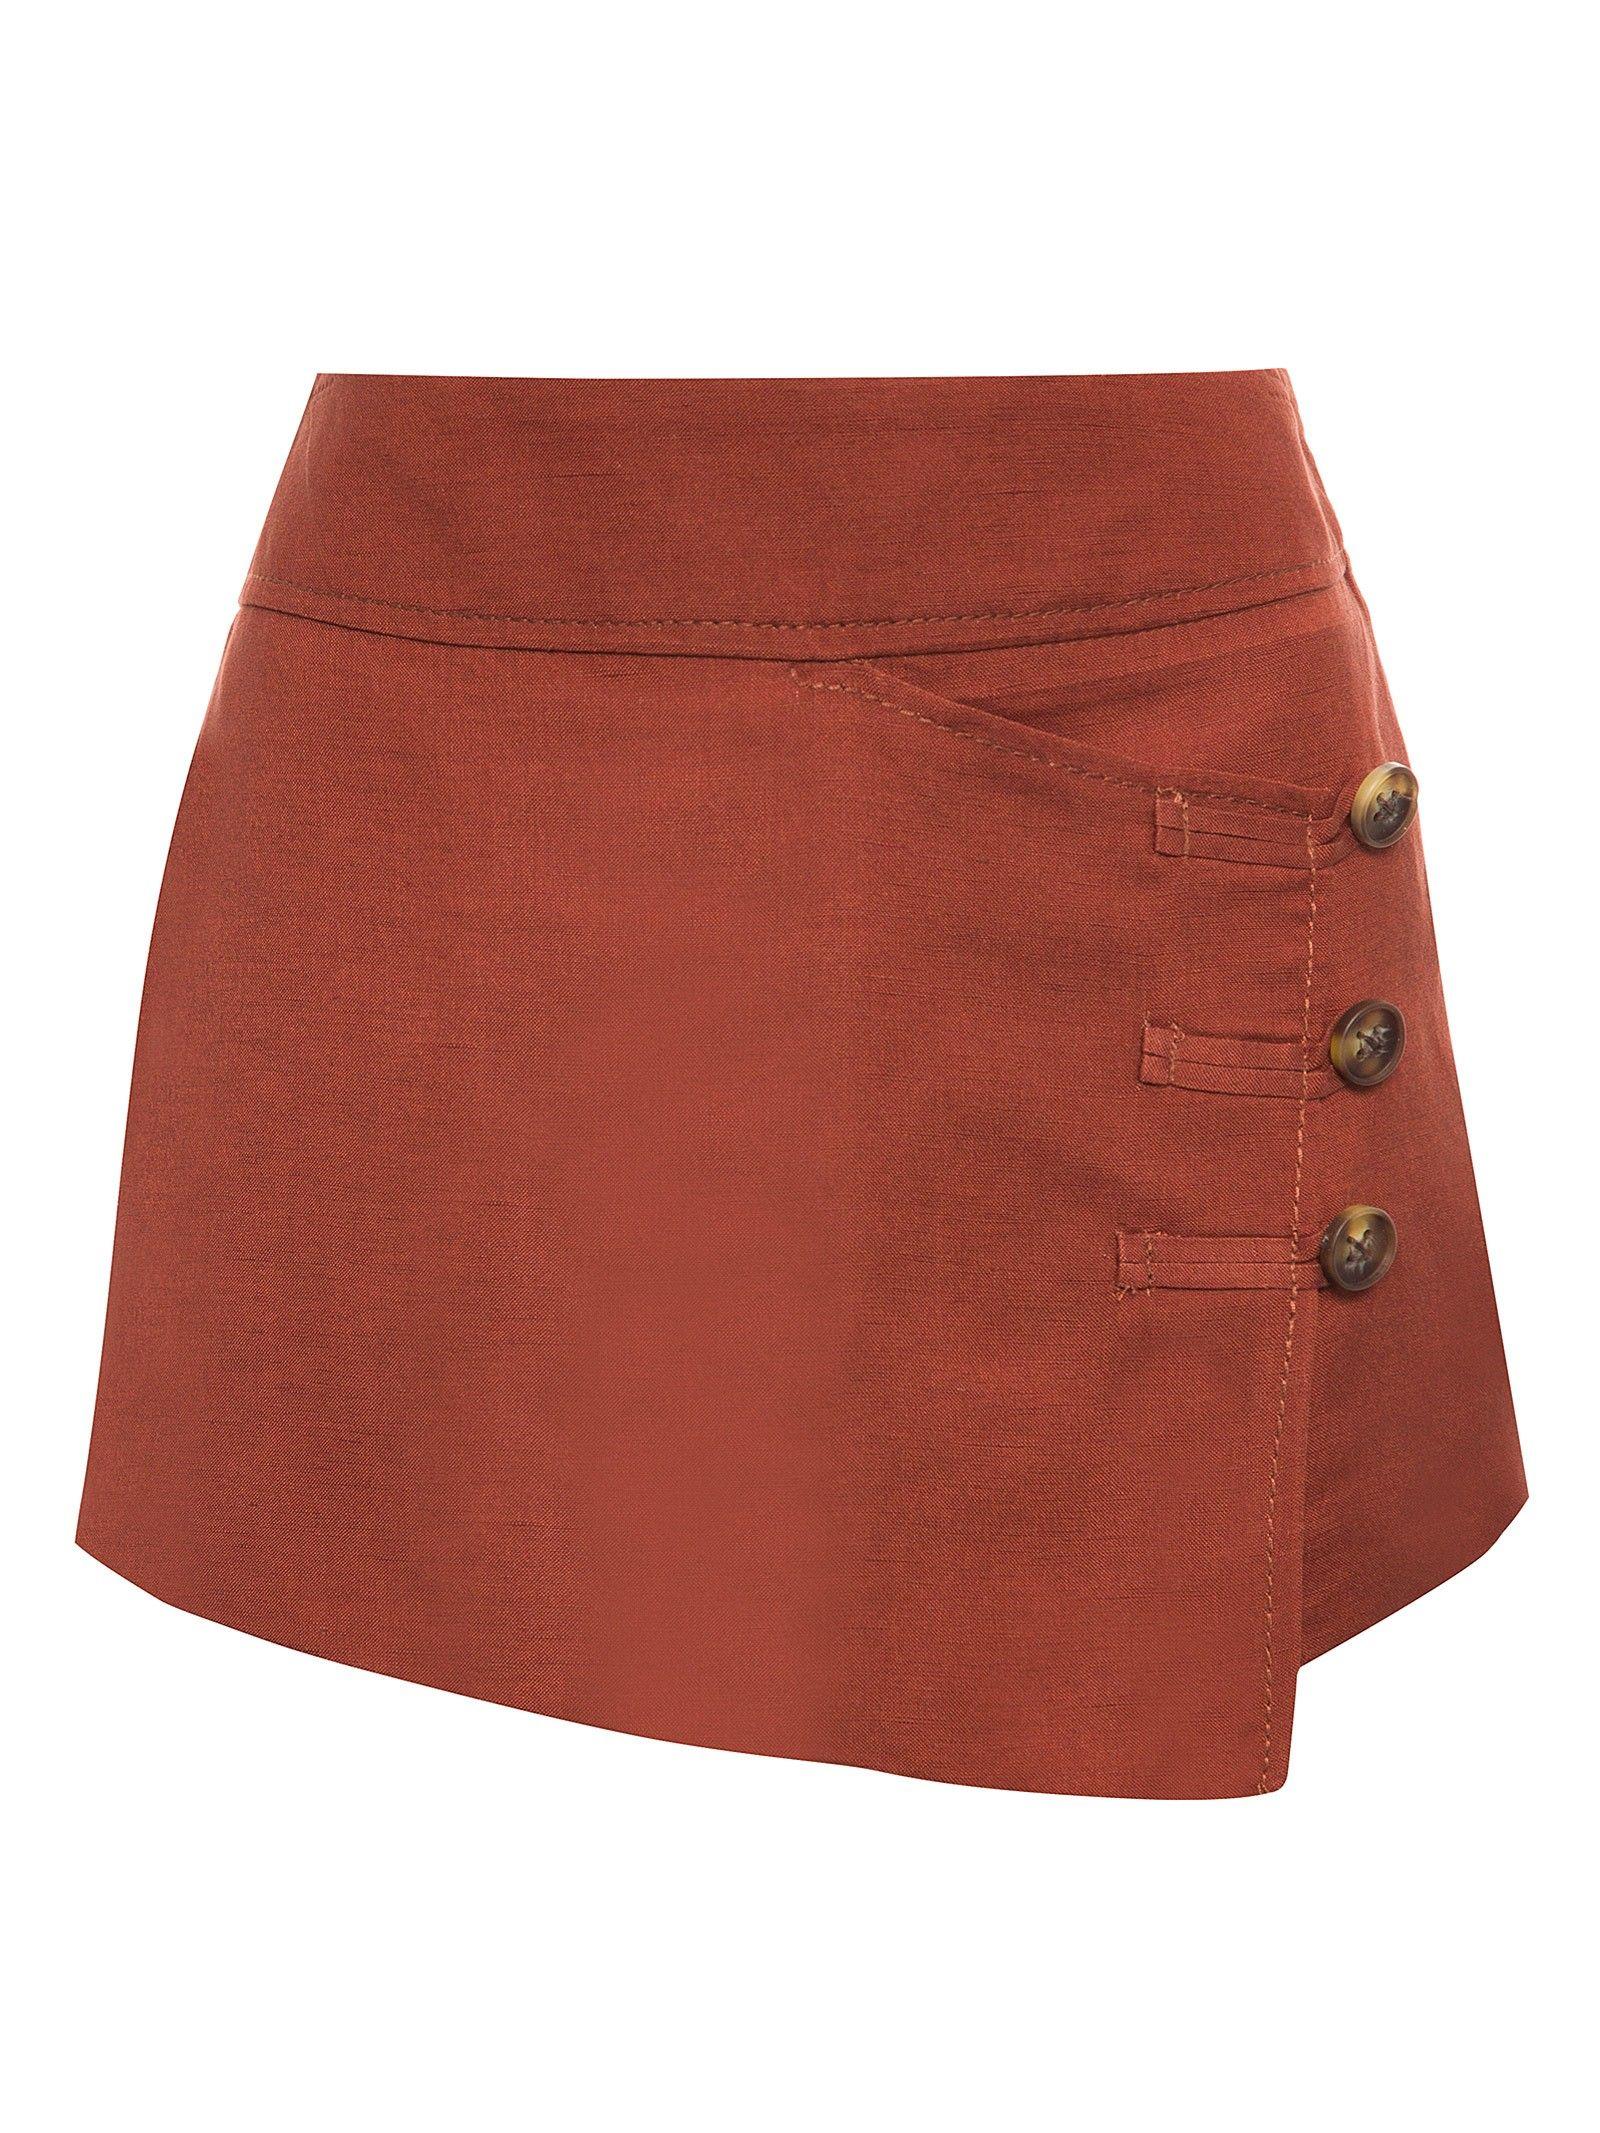 727d63b2ed Modelos de falda chor  falda  modelos  modelosdeFalda Pantalones Femeninos